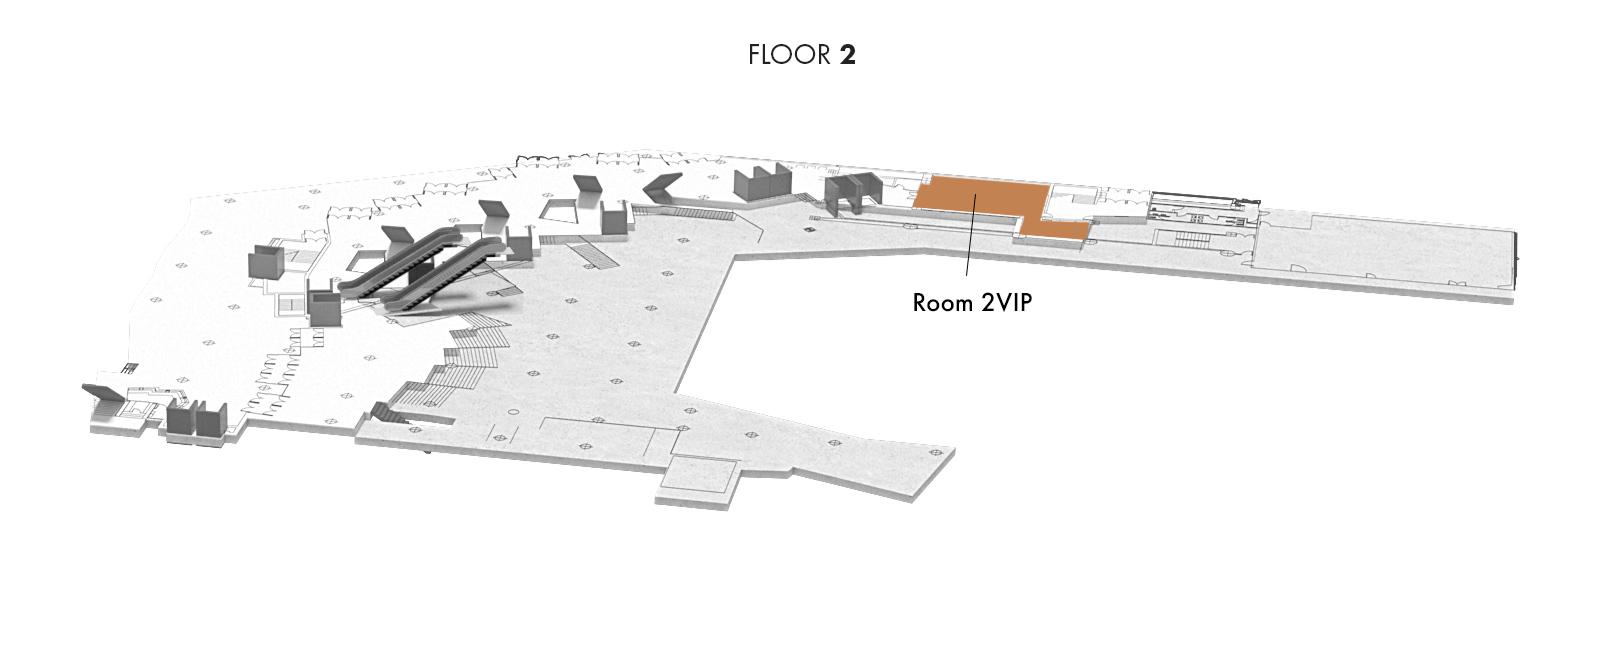 Room 2VIP, Floor 2 | Palacio Euskalduna Jauregia